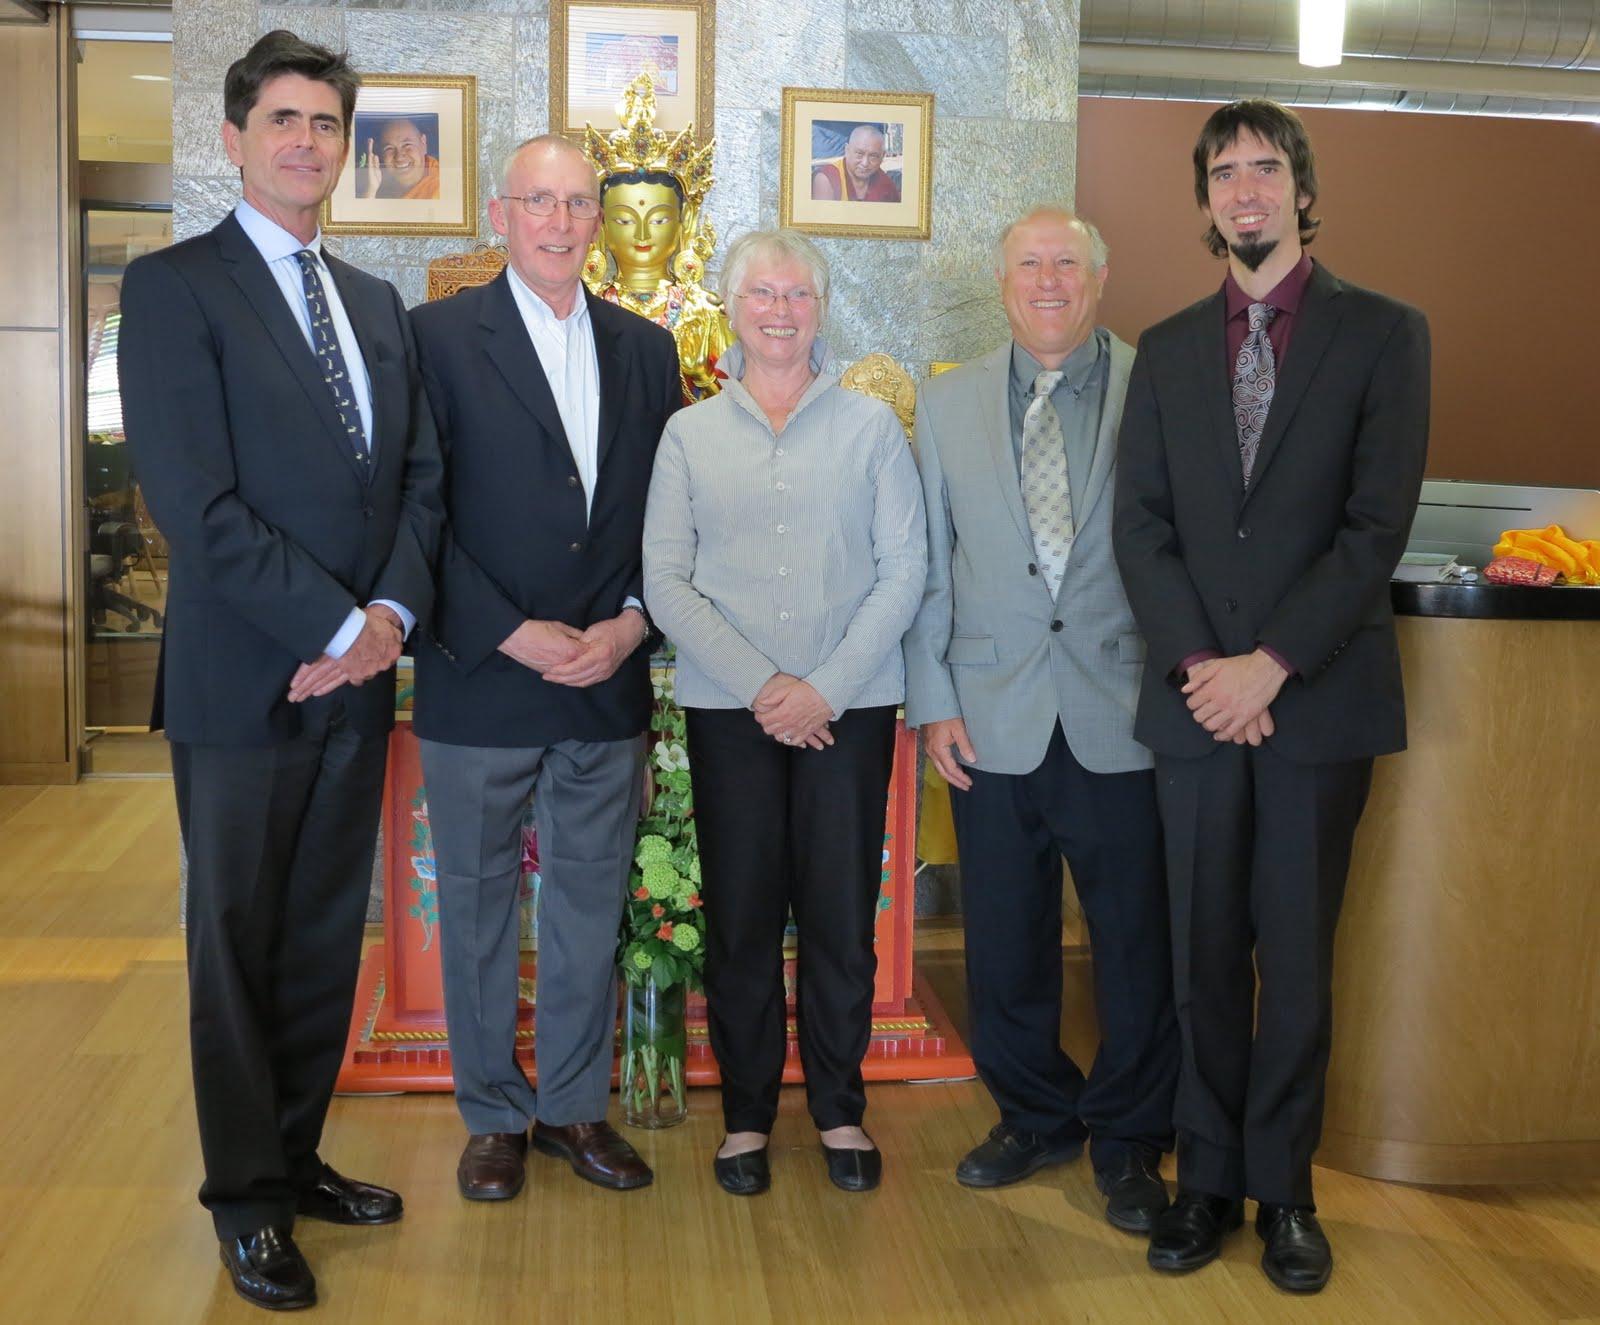 Five FPMT Board Members at FPMT International Office: Tim McNeill, Peter Kedge, Paula de Wijs-Koolkin, Karuna Cayton, Tenzin Ösel Hita.